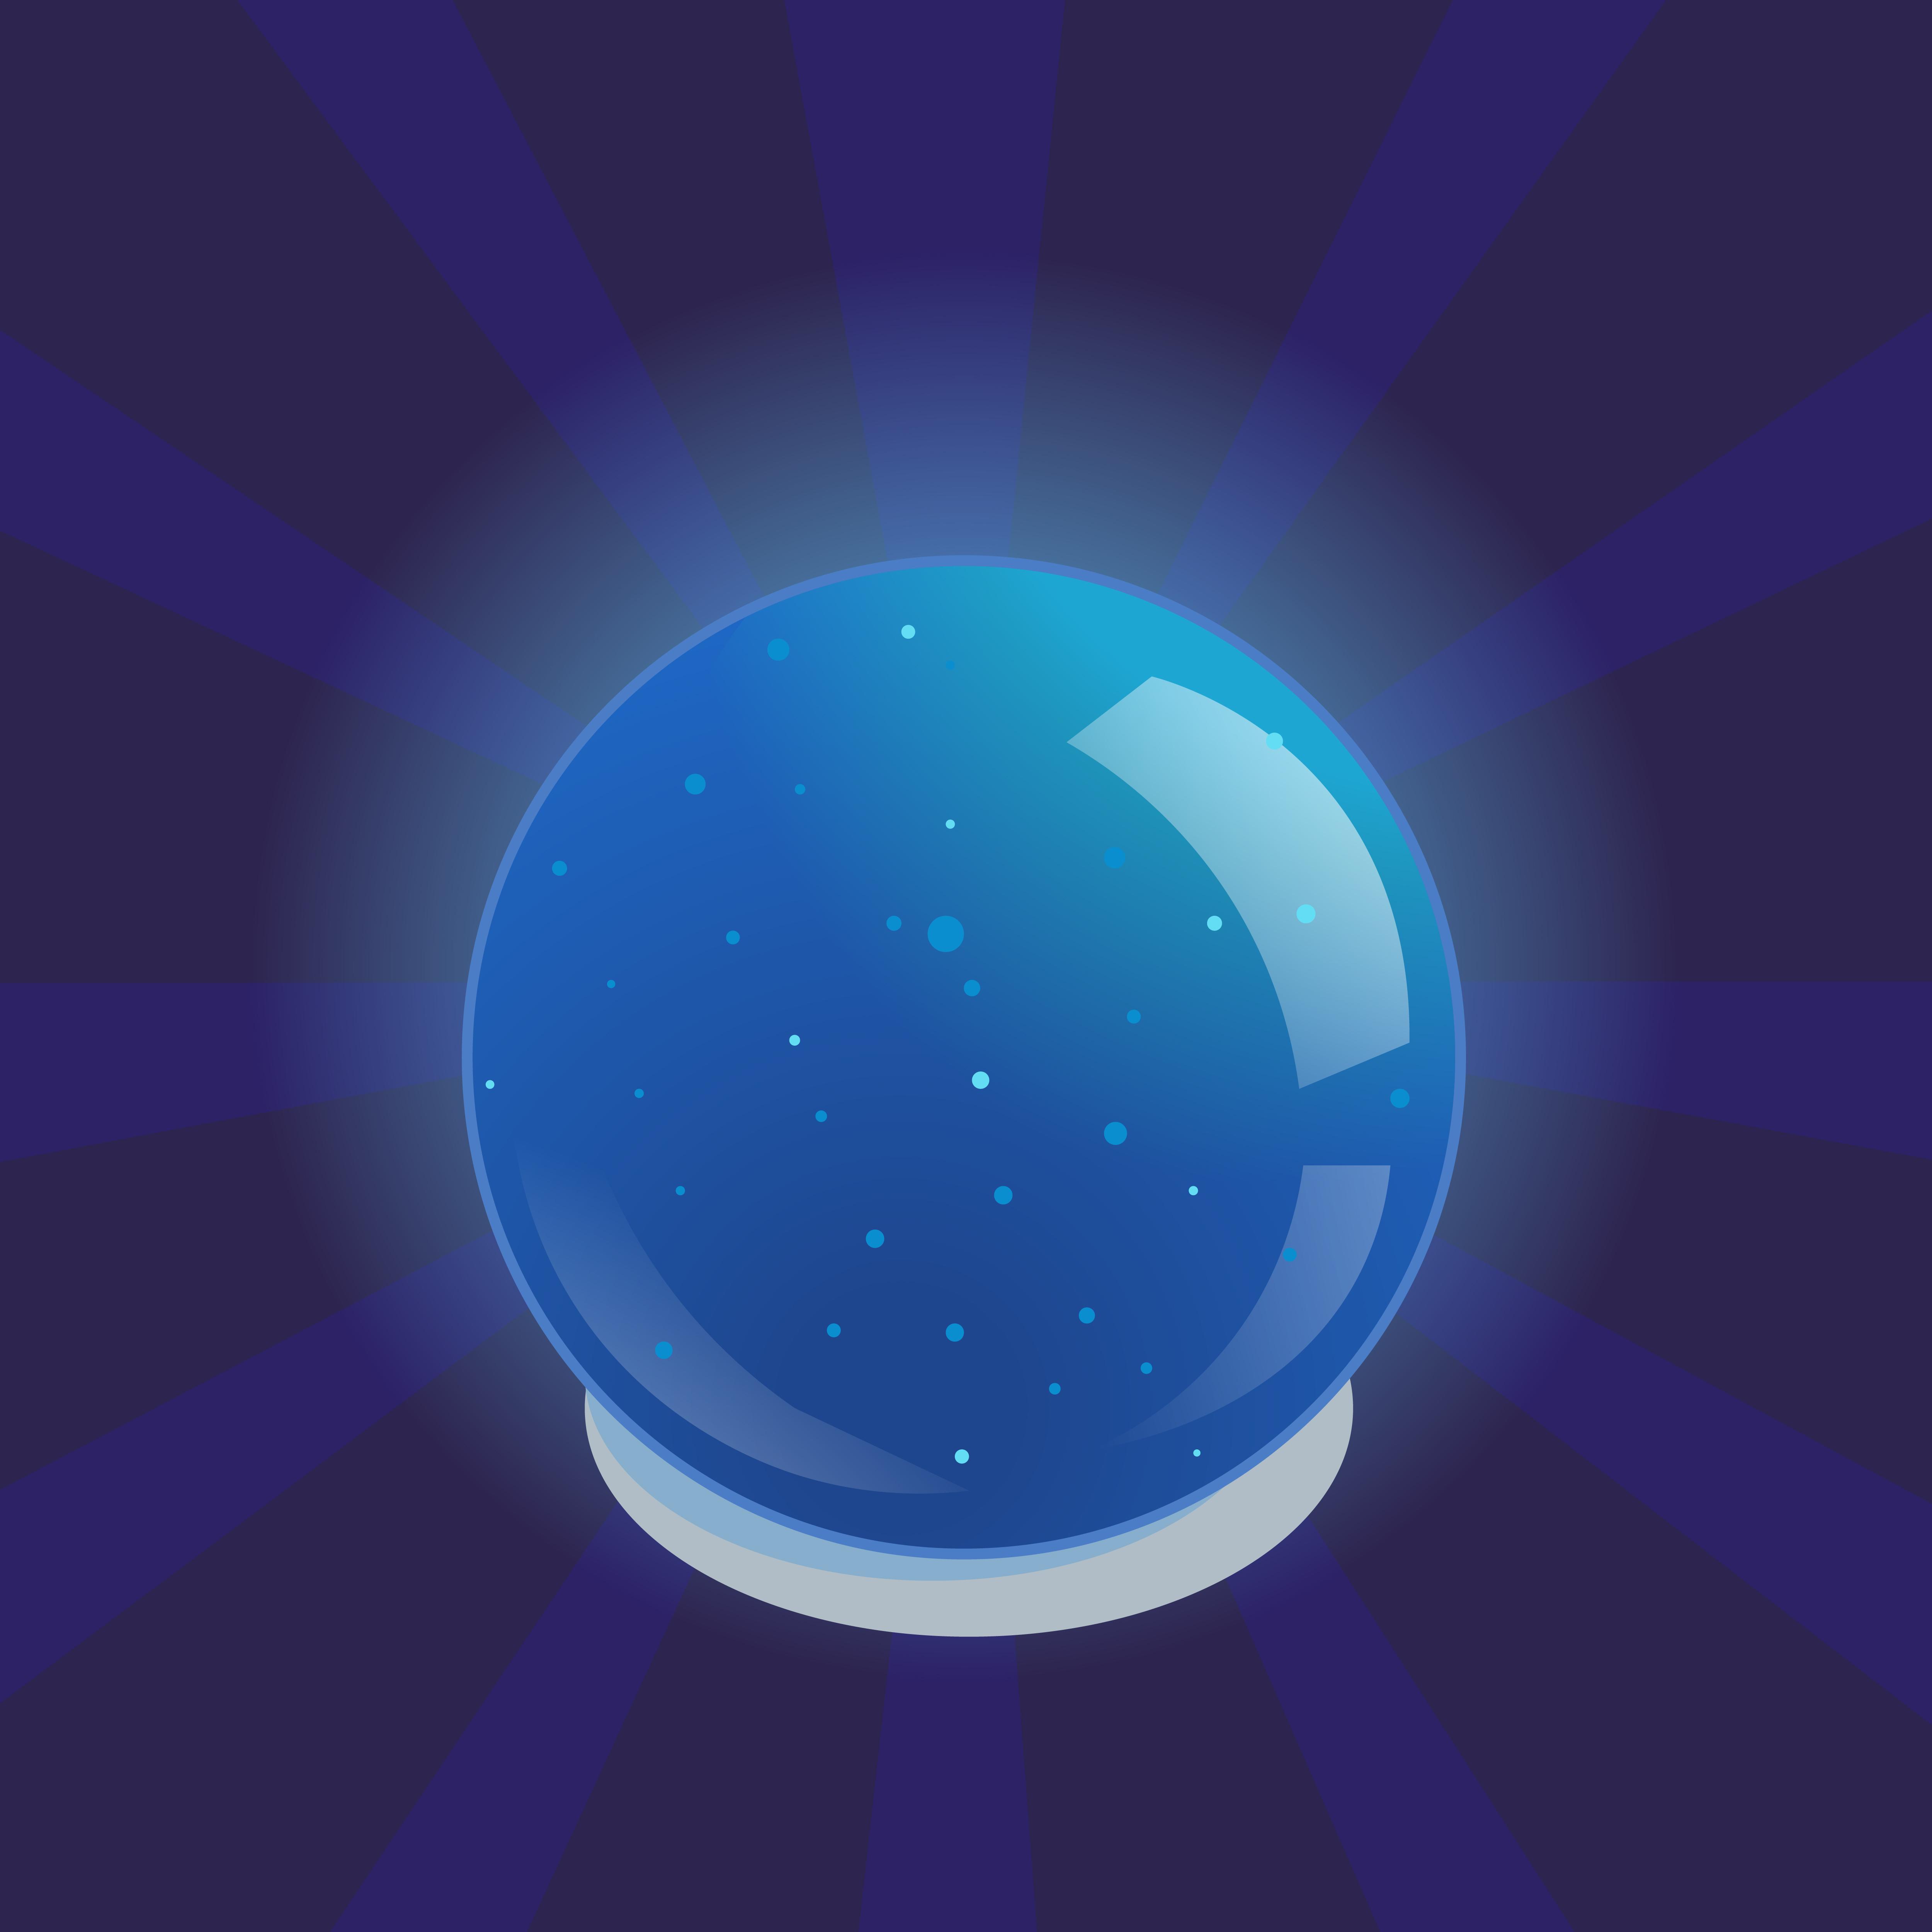 Blue Glowing Magic Ball Vector Cartoon Illustration